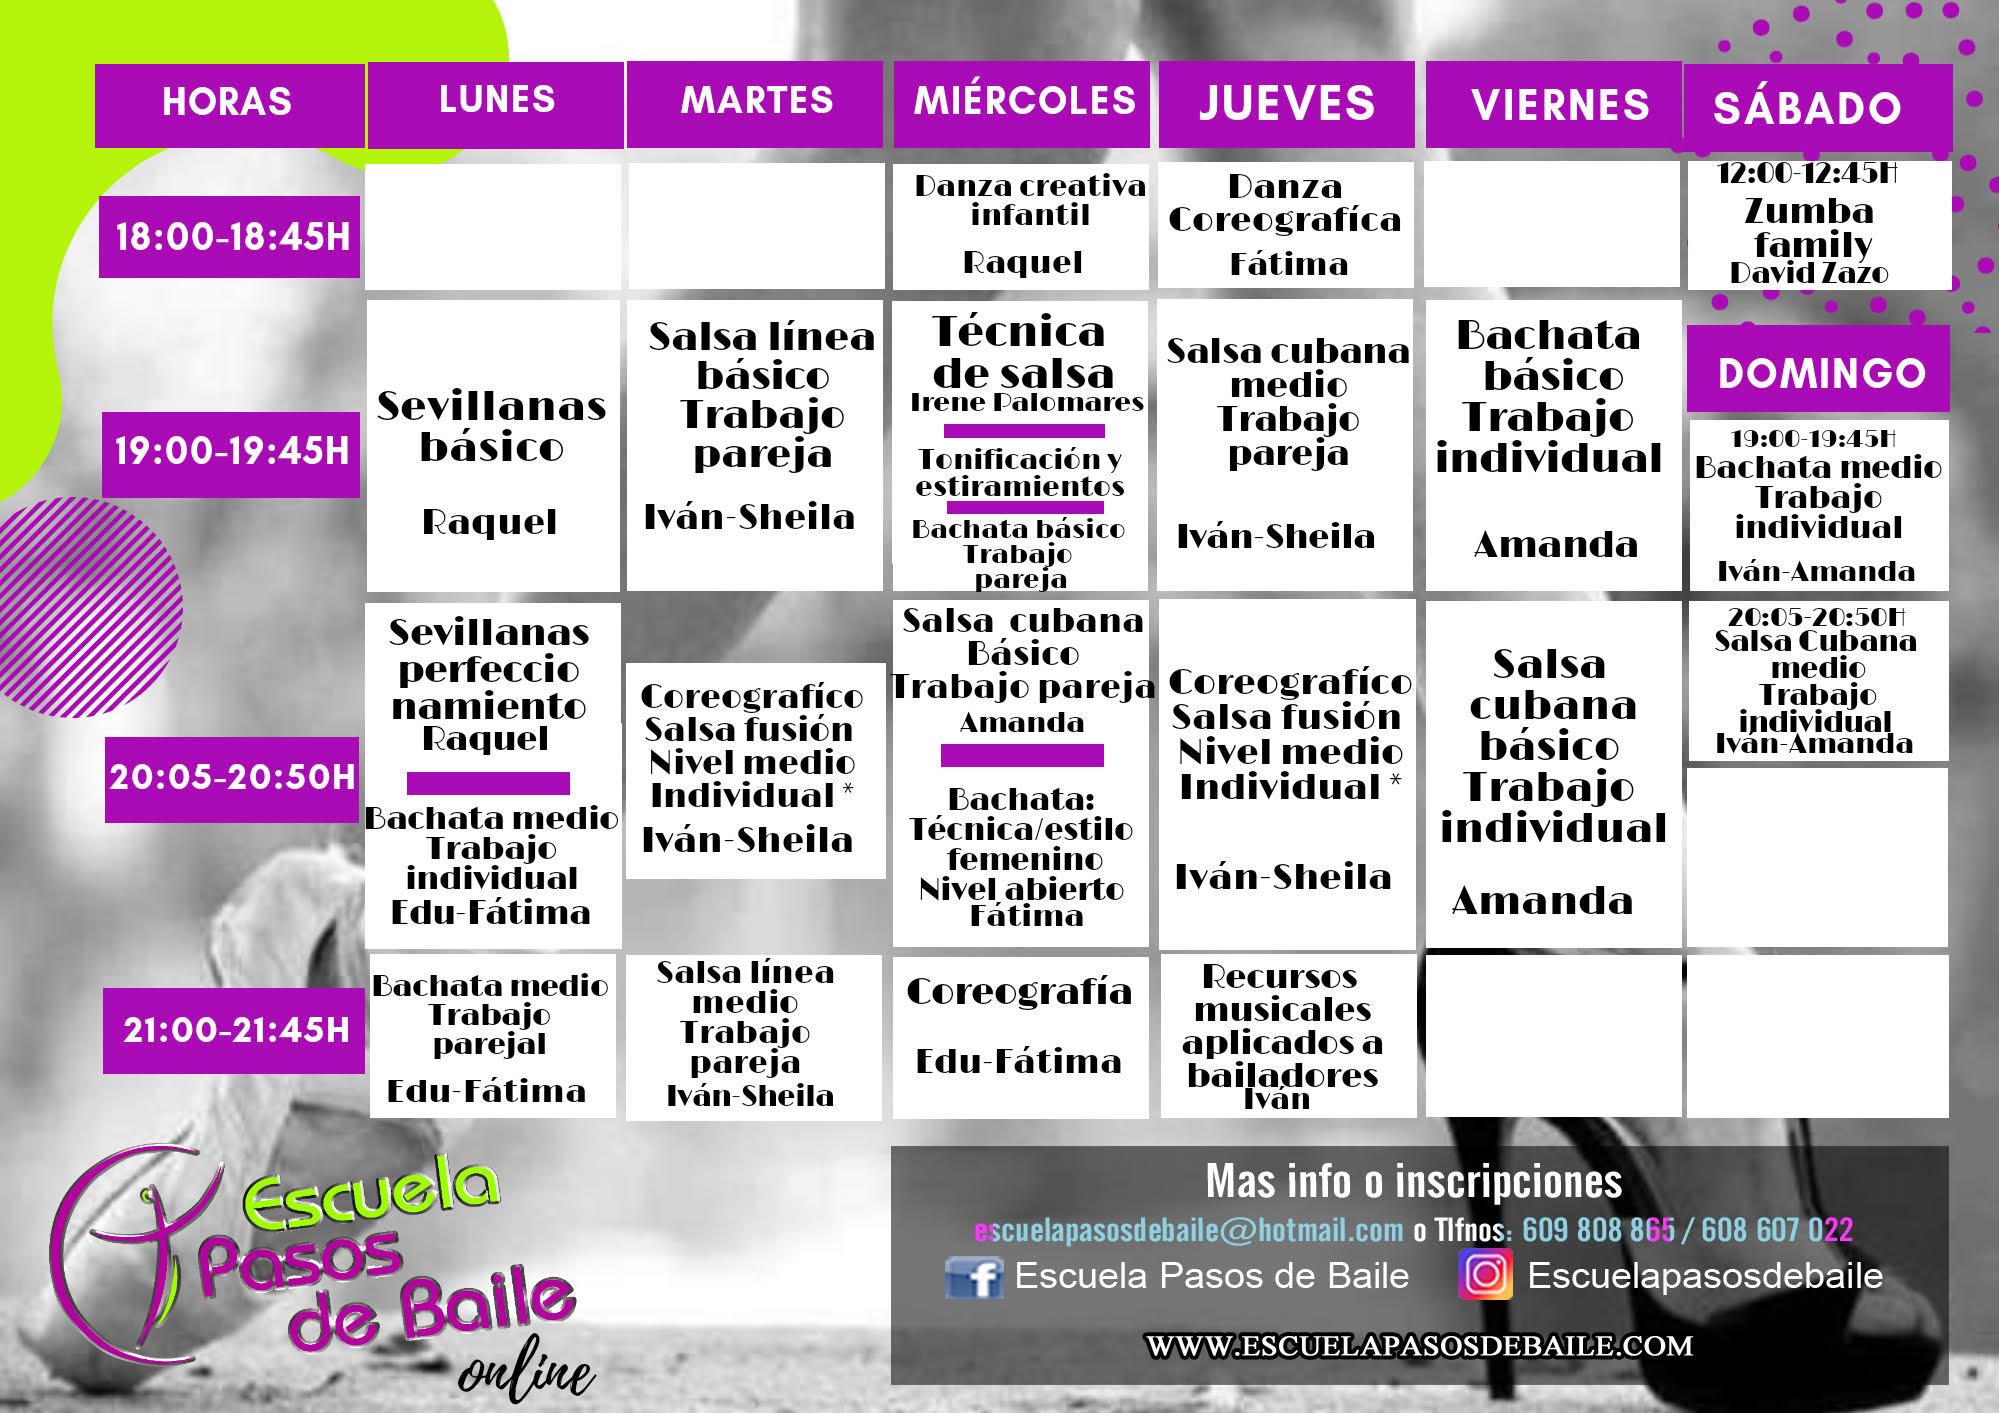 Clases de baile online - ESCUELA PASOS DE BAILE